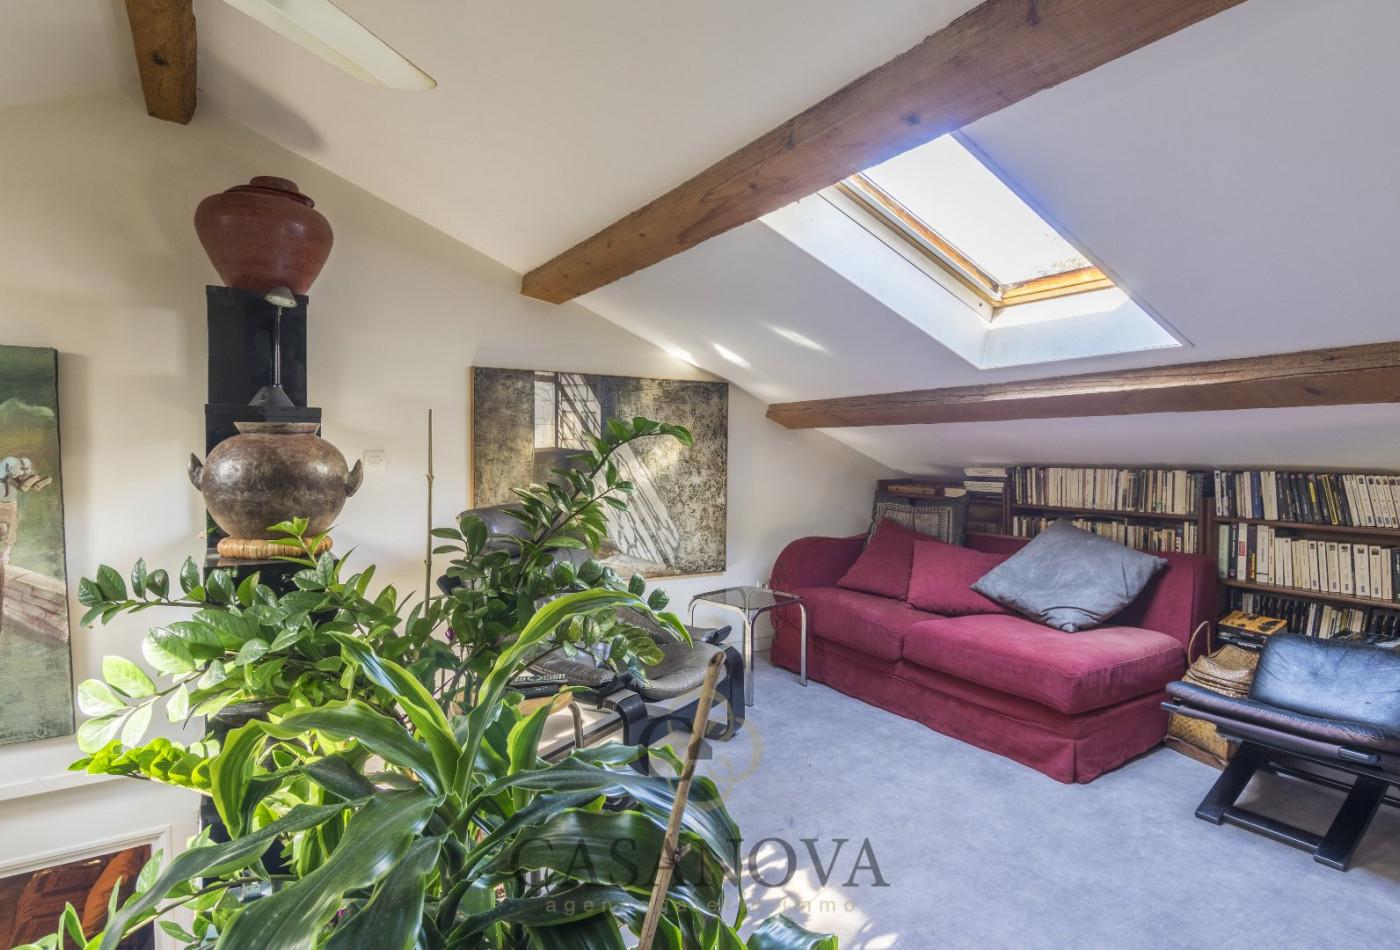 A vendre  Montpellier | Réf 340147993 - Agence galerie casanova